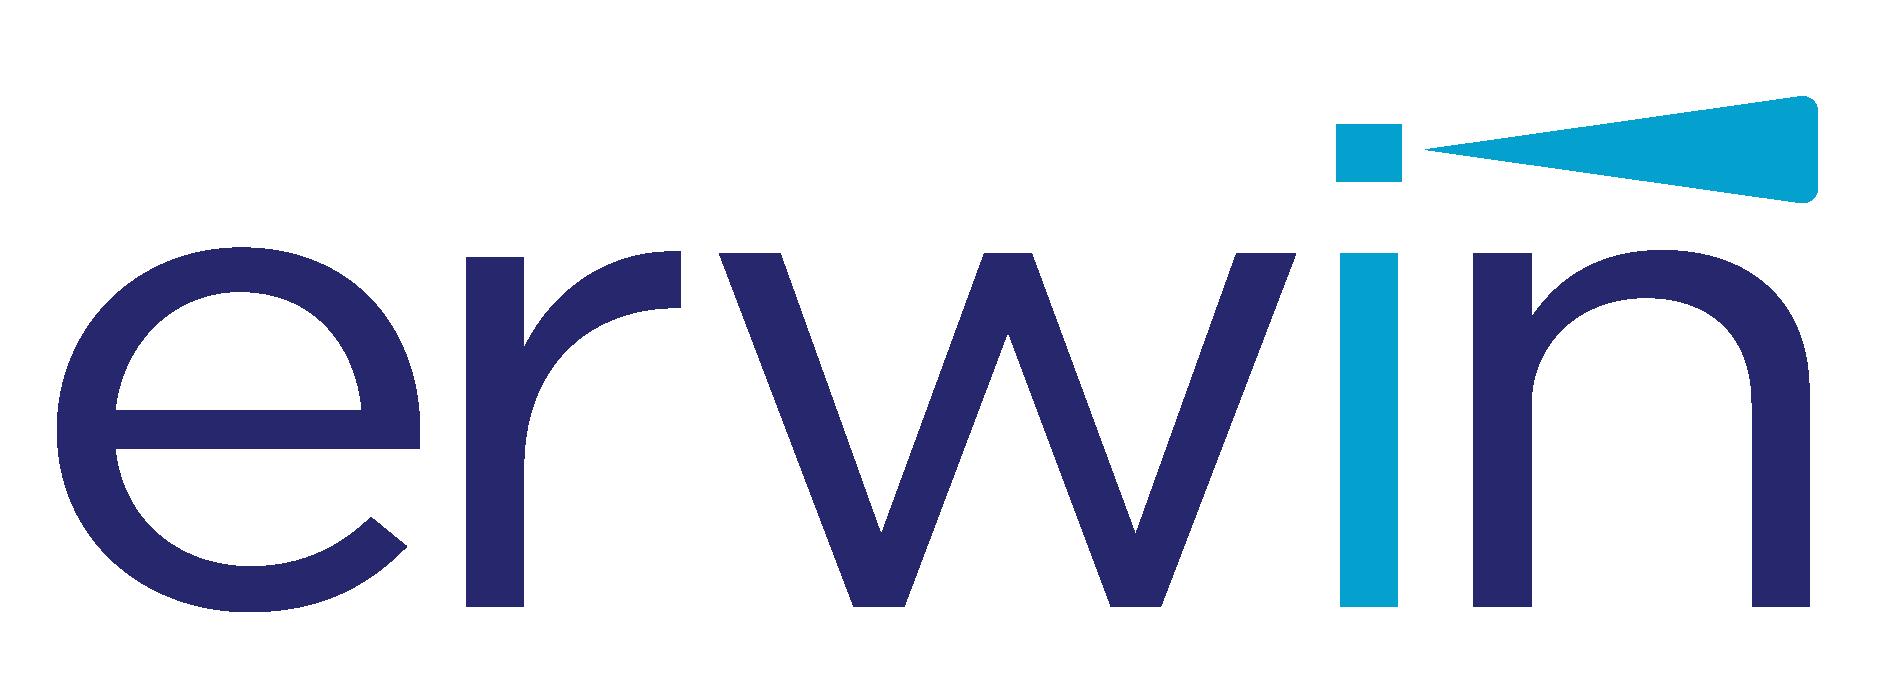 Erwin_logo